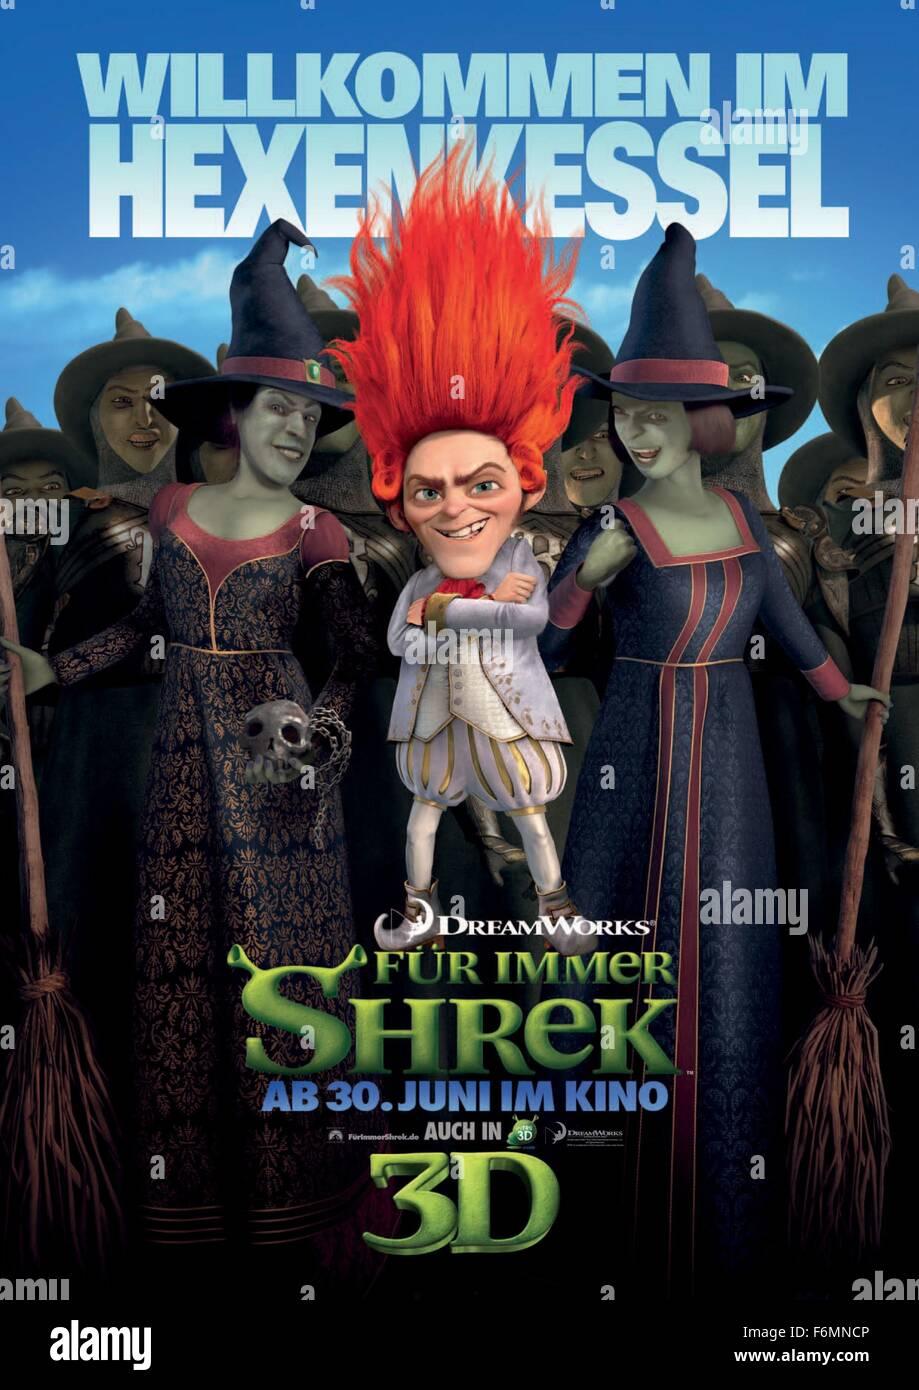 Shrek felizes para sempre online dating